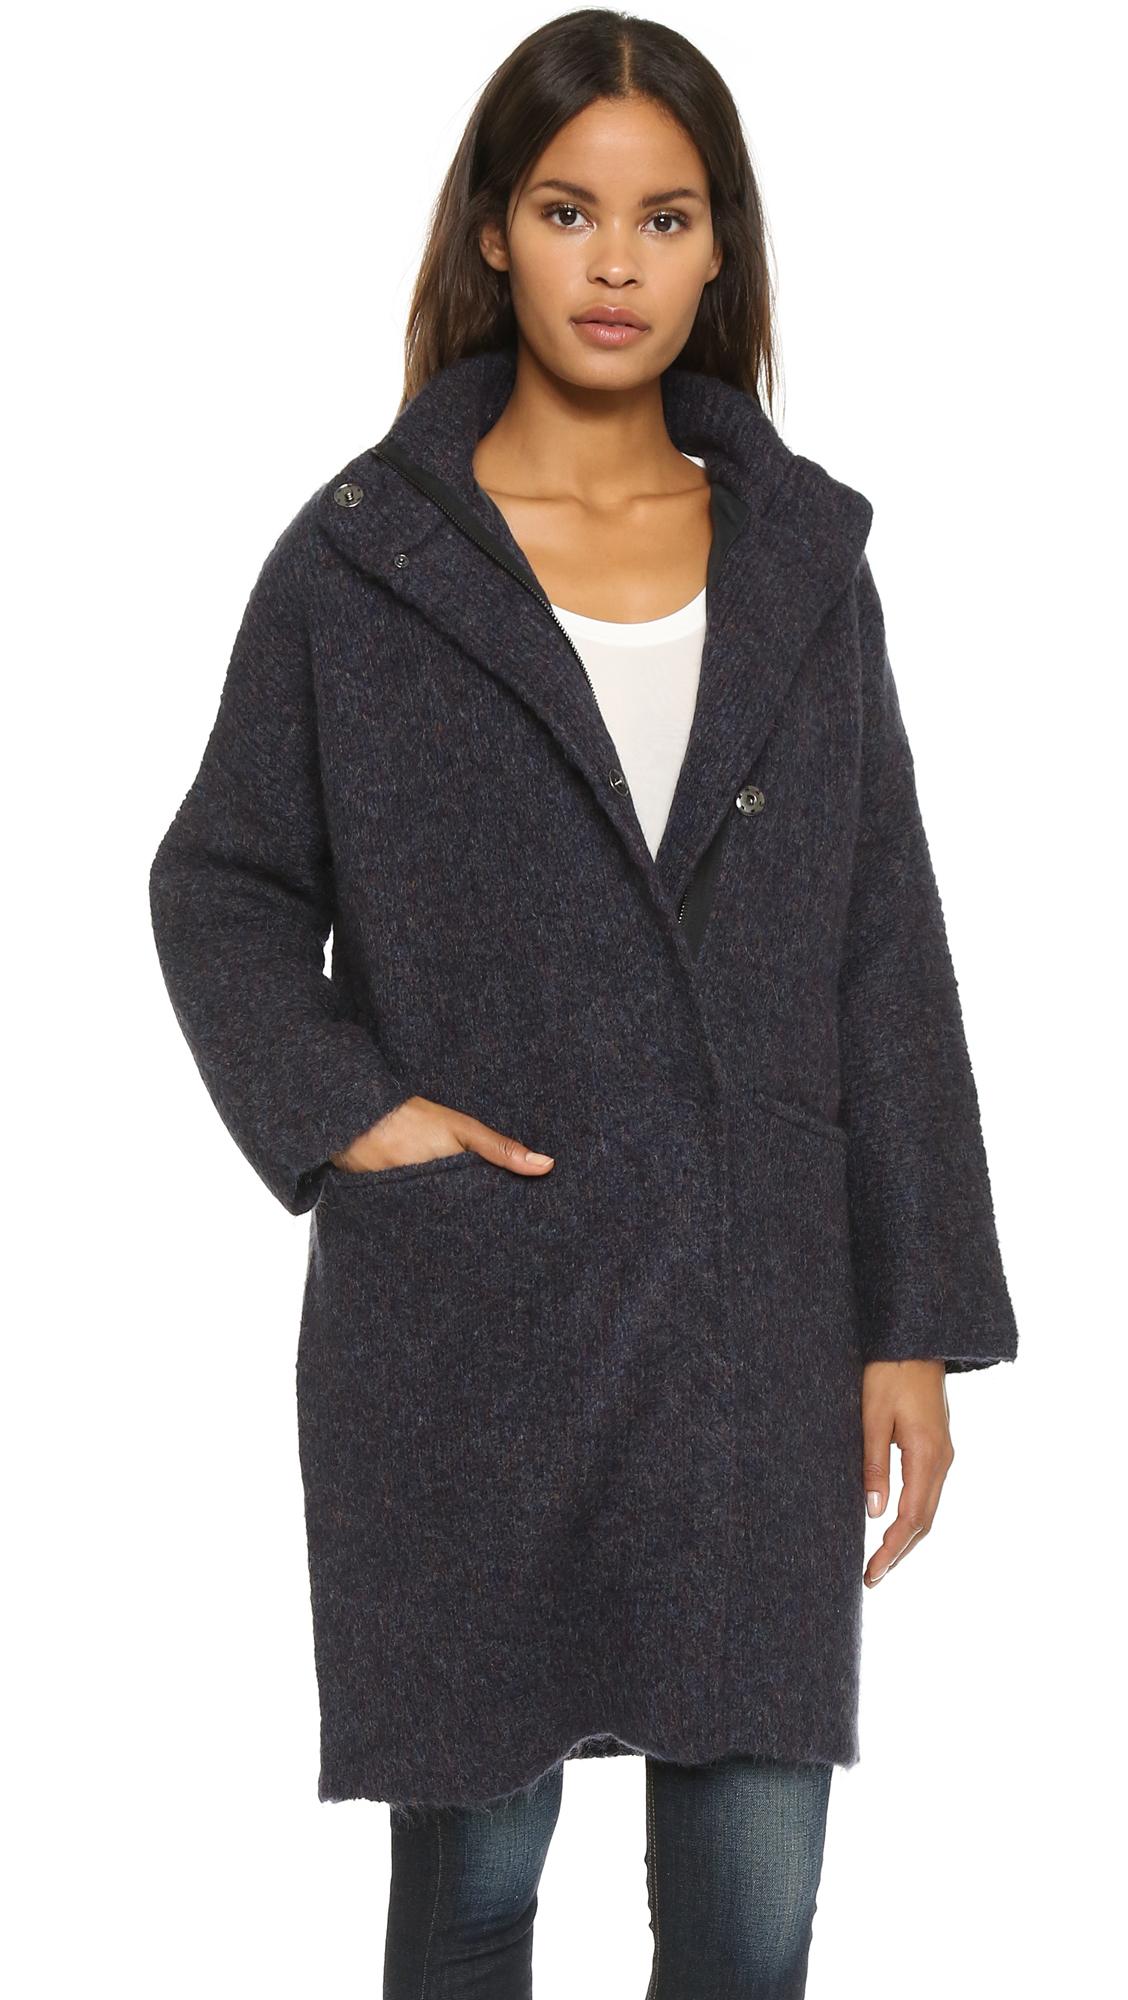 Rag & bone Cammie Sweater Coat - Navy in Blue | Lyst